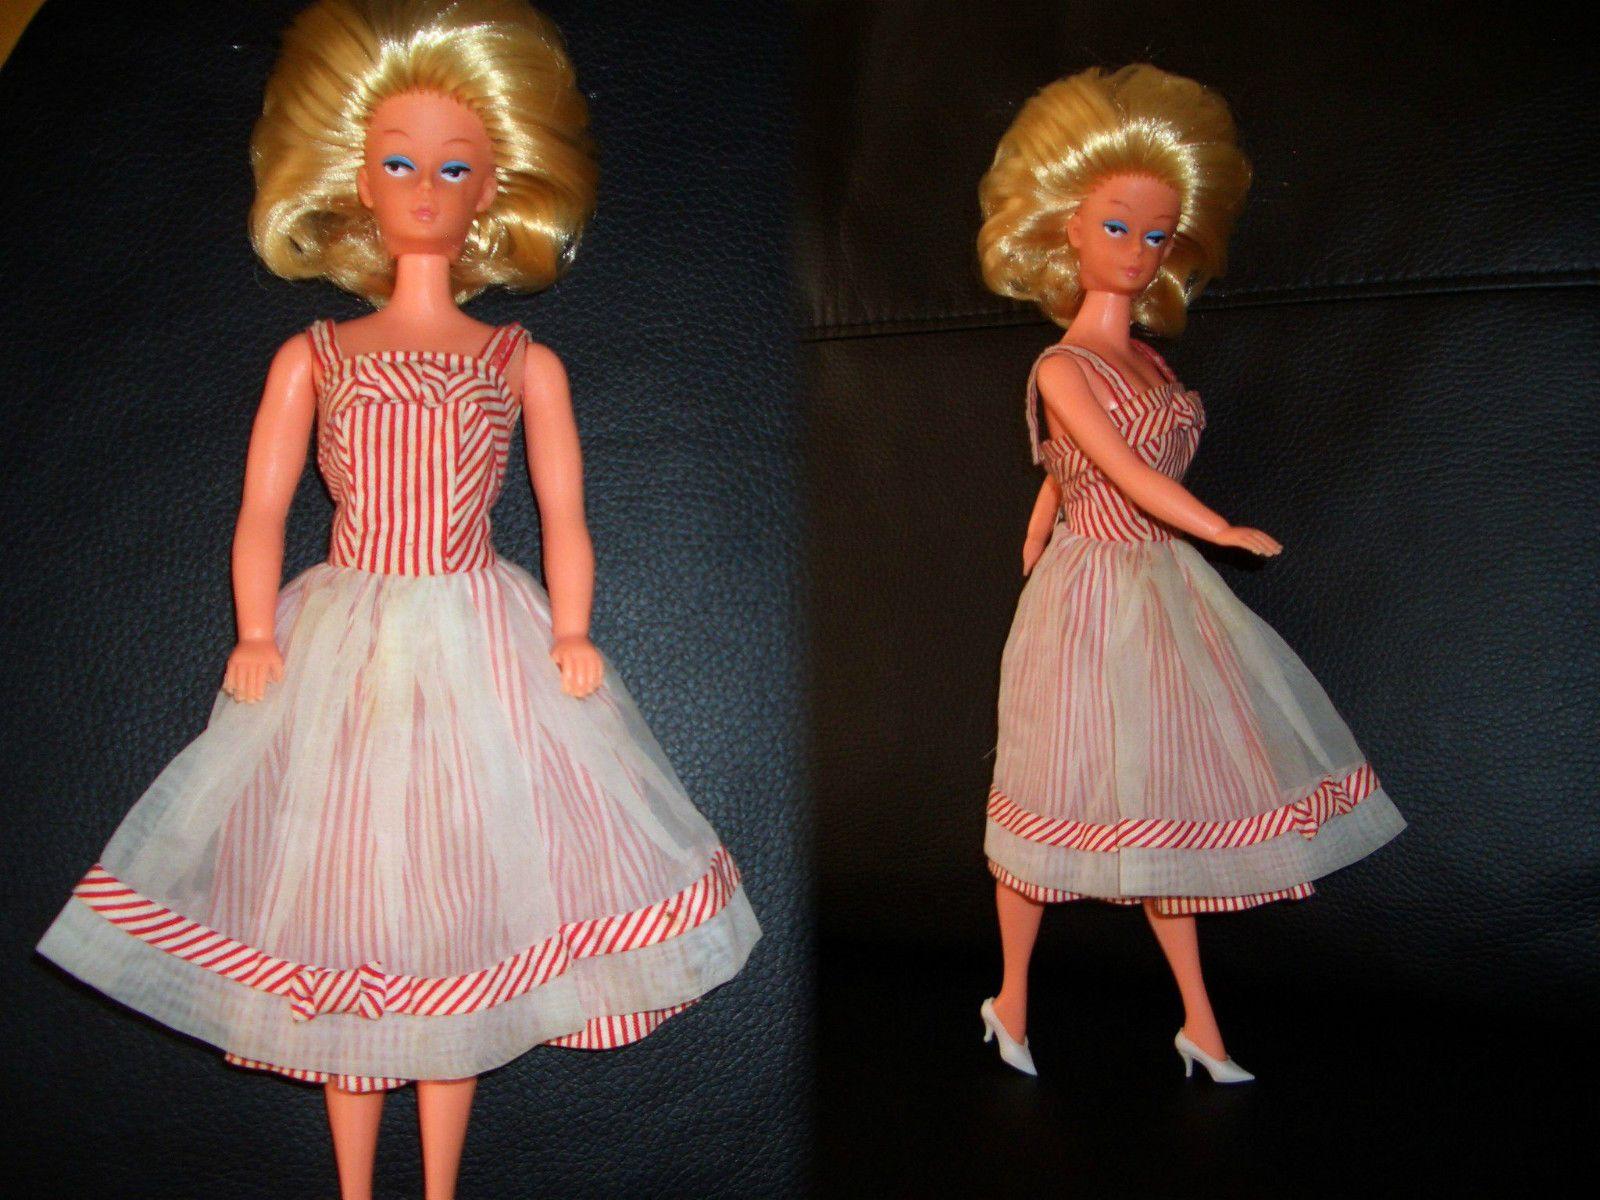 Barbiepuppen & Zubehör /Mattel Vintage BARBIE  PUPPE DOLL CLONE STEFFI HONG KONG FACE Puppen & Zubehör